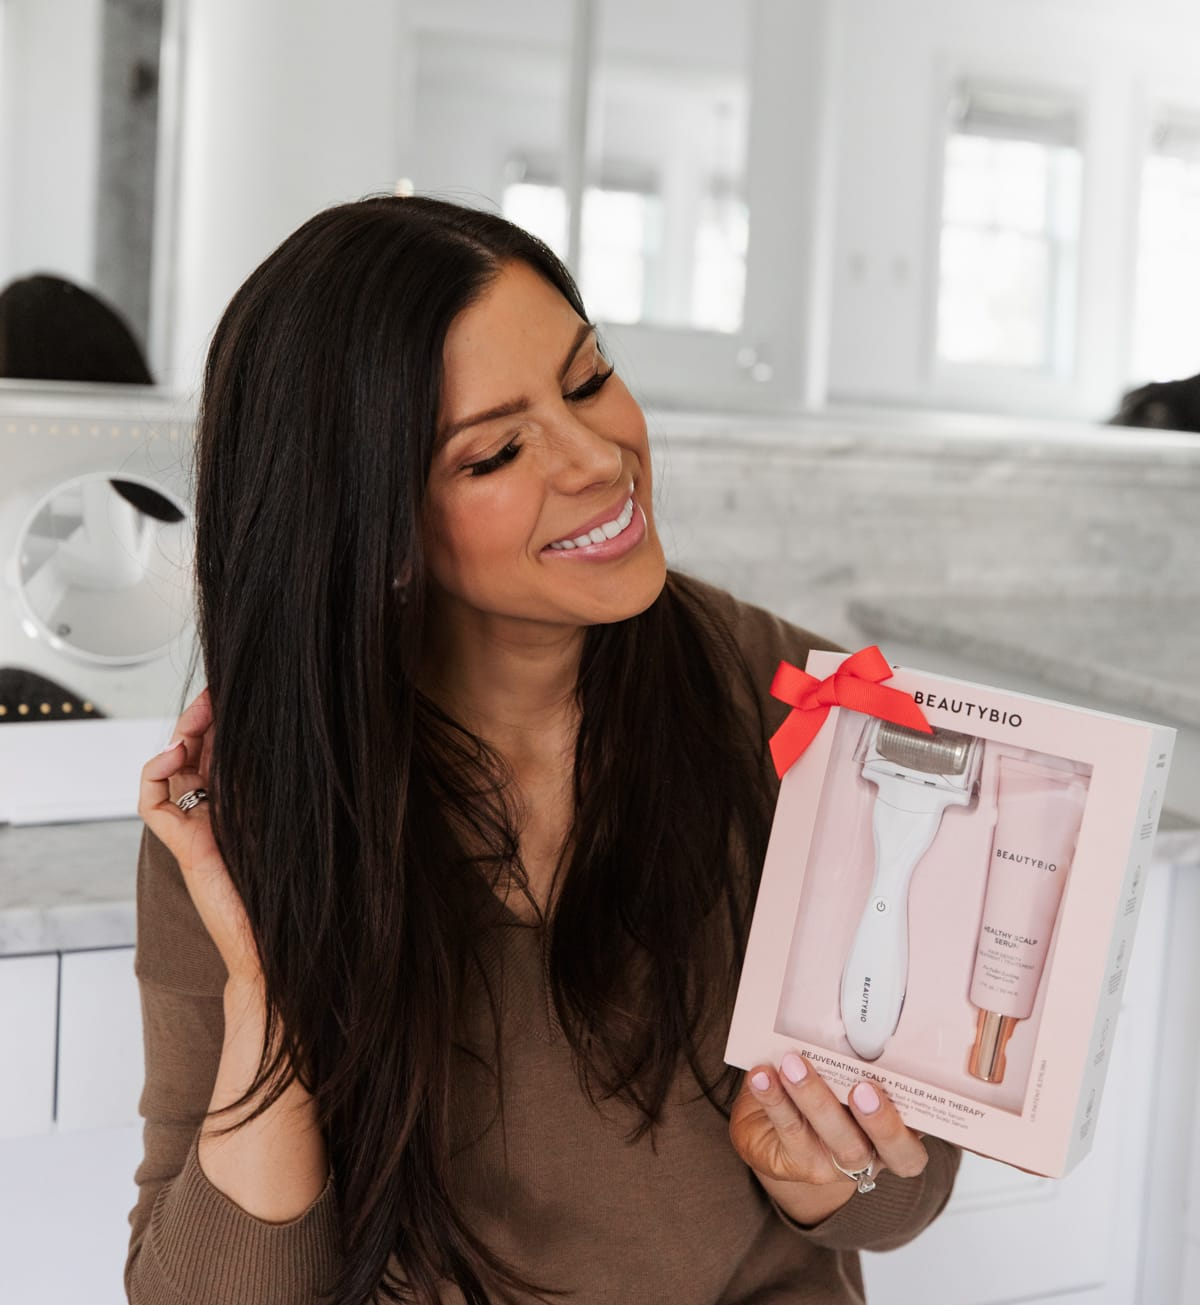 glopro beauty bio set gift ideas